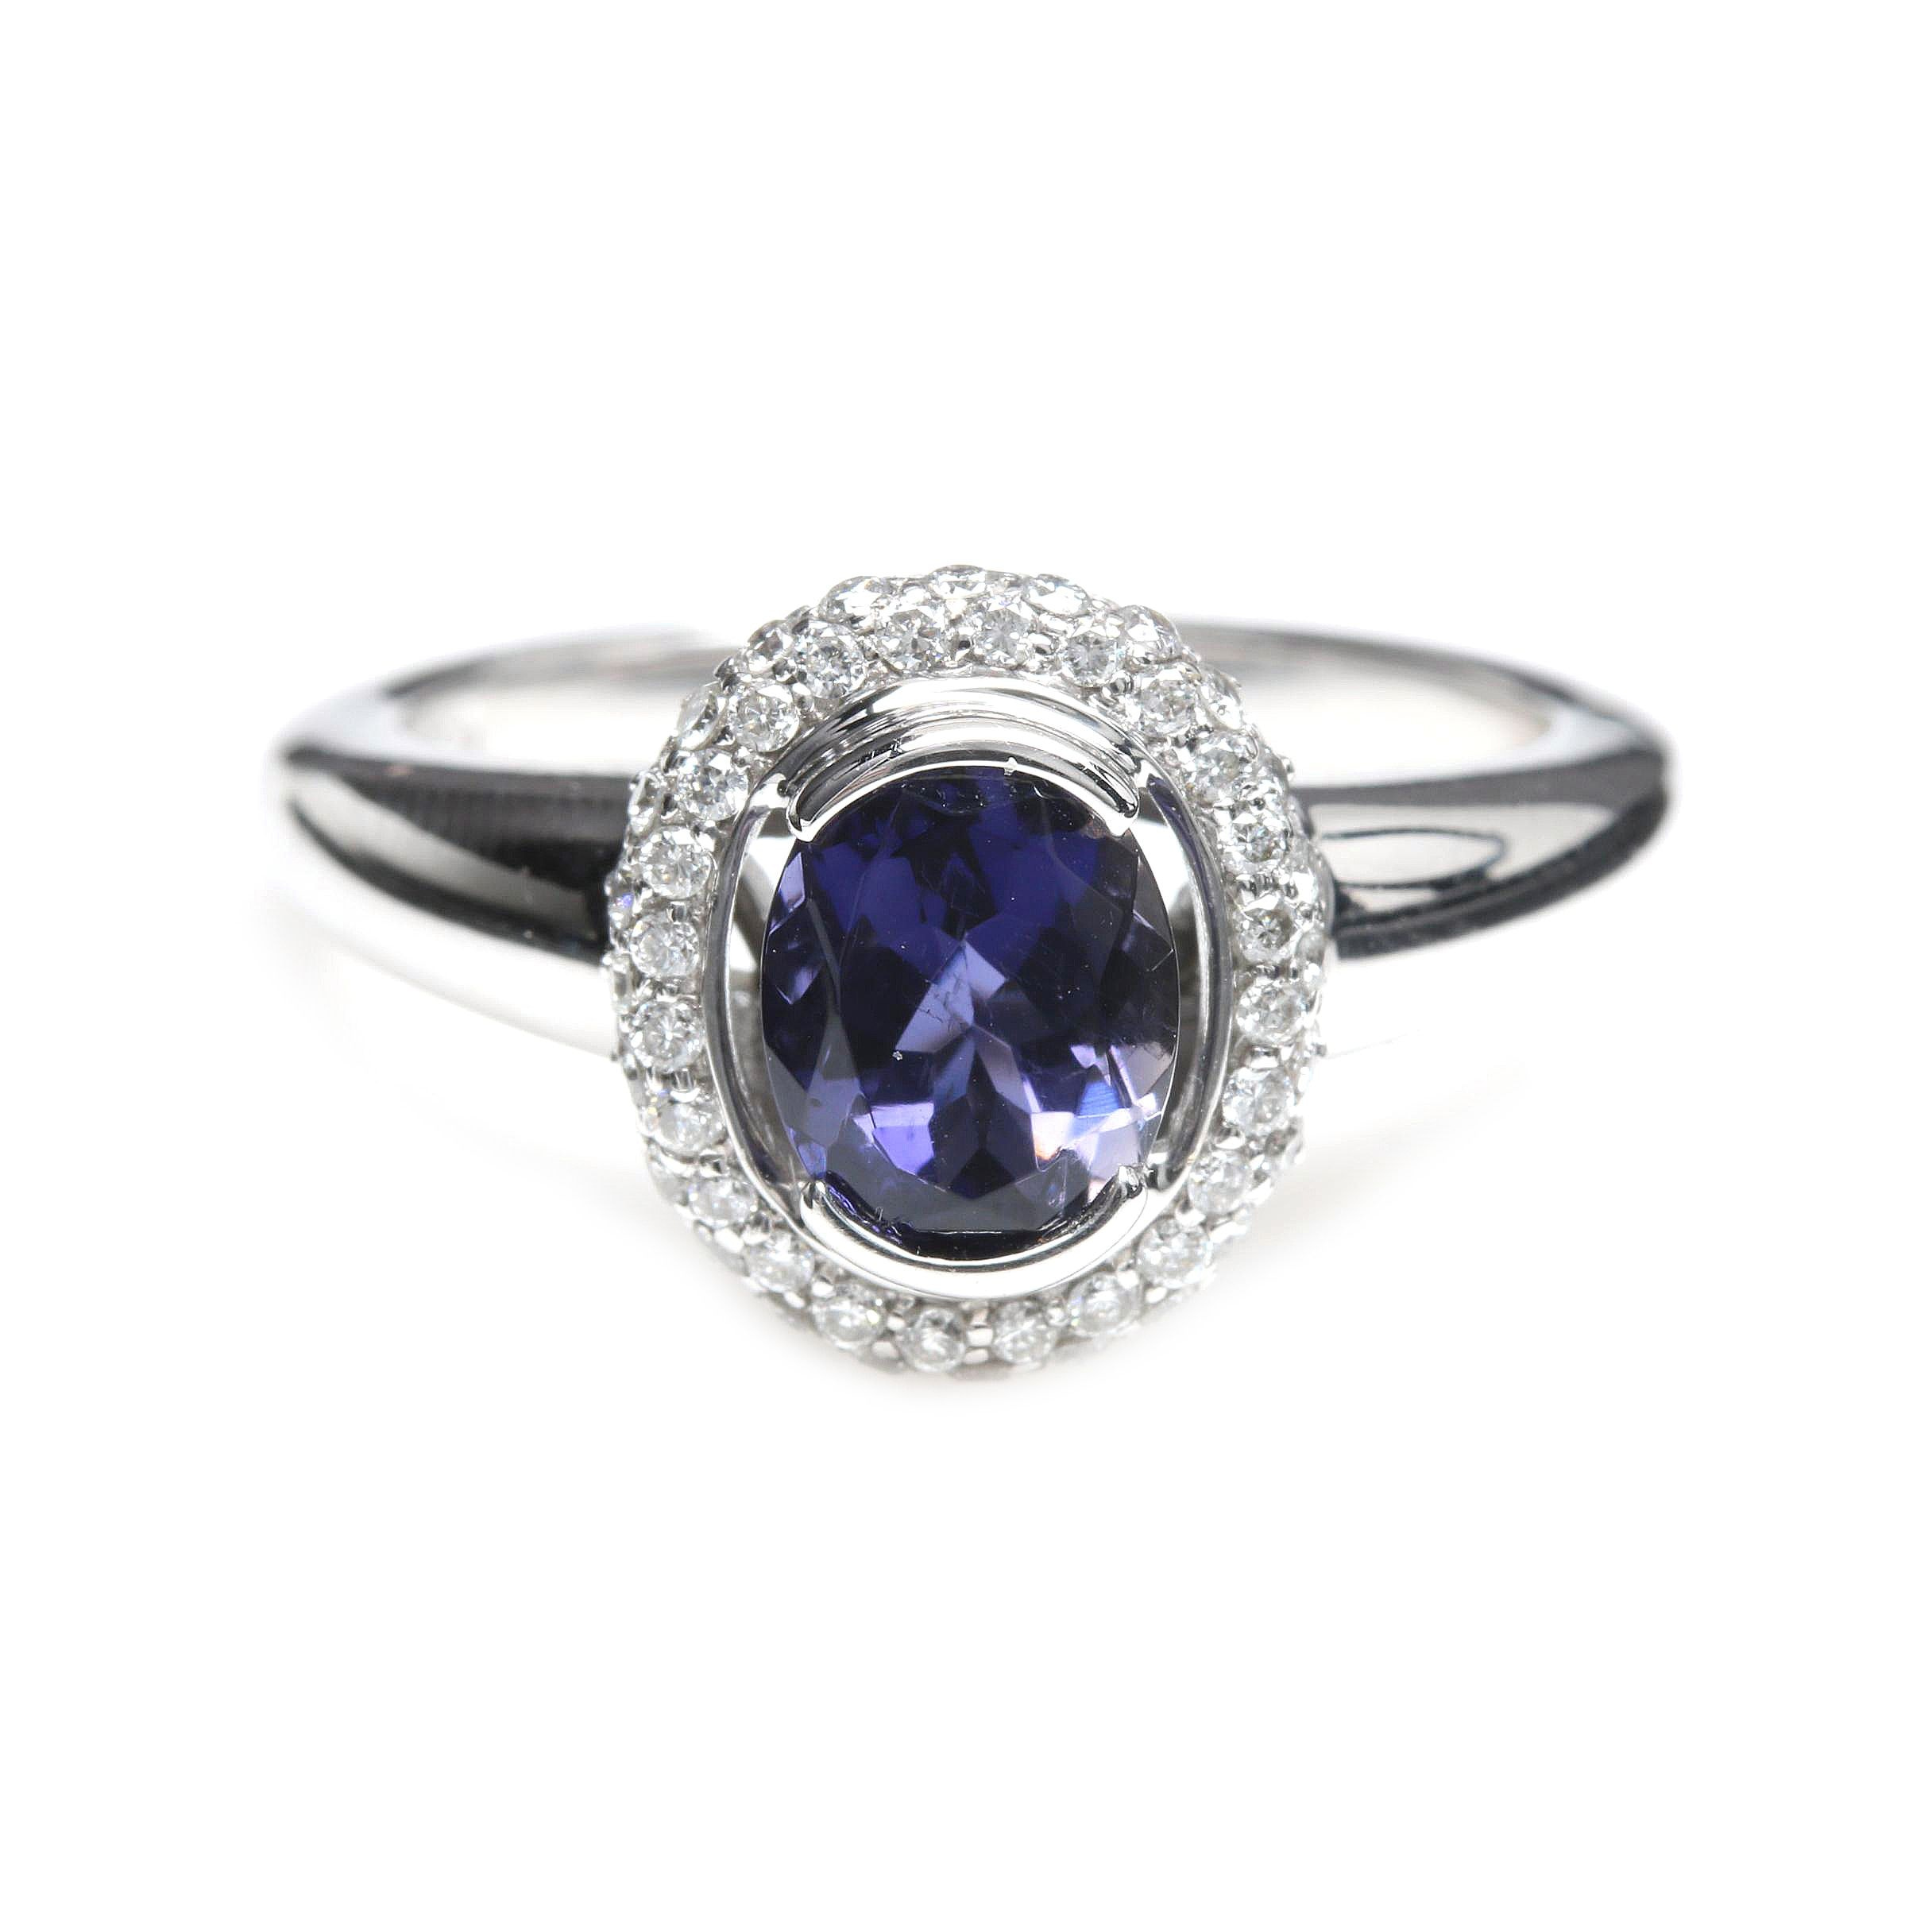 18K White Gold Iolite and Diamond Ring